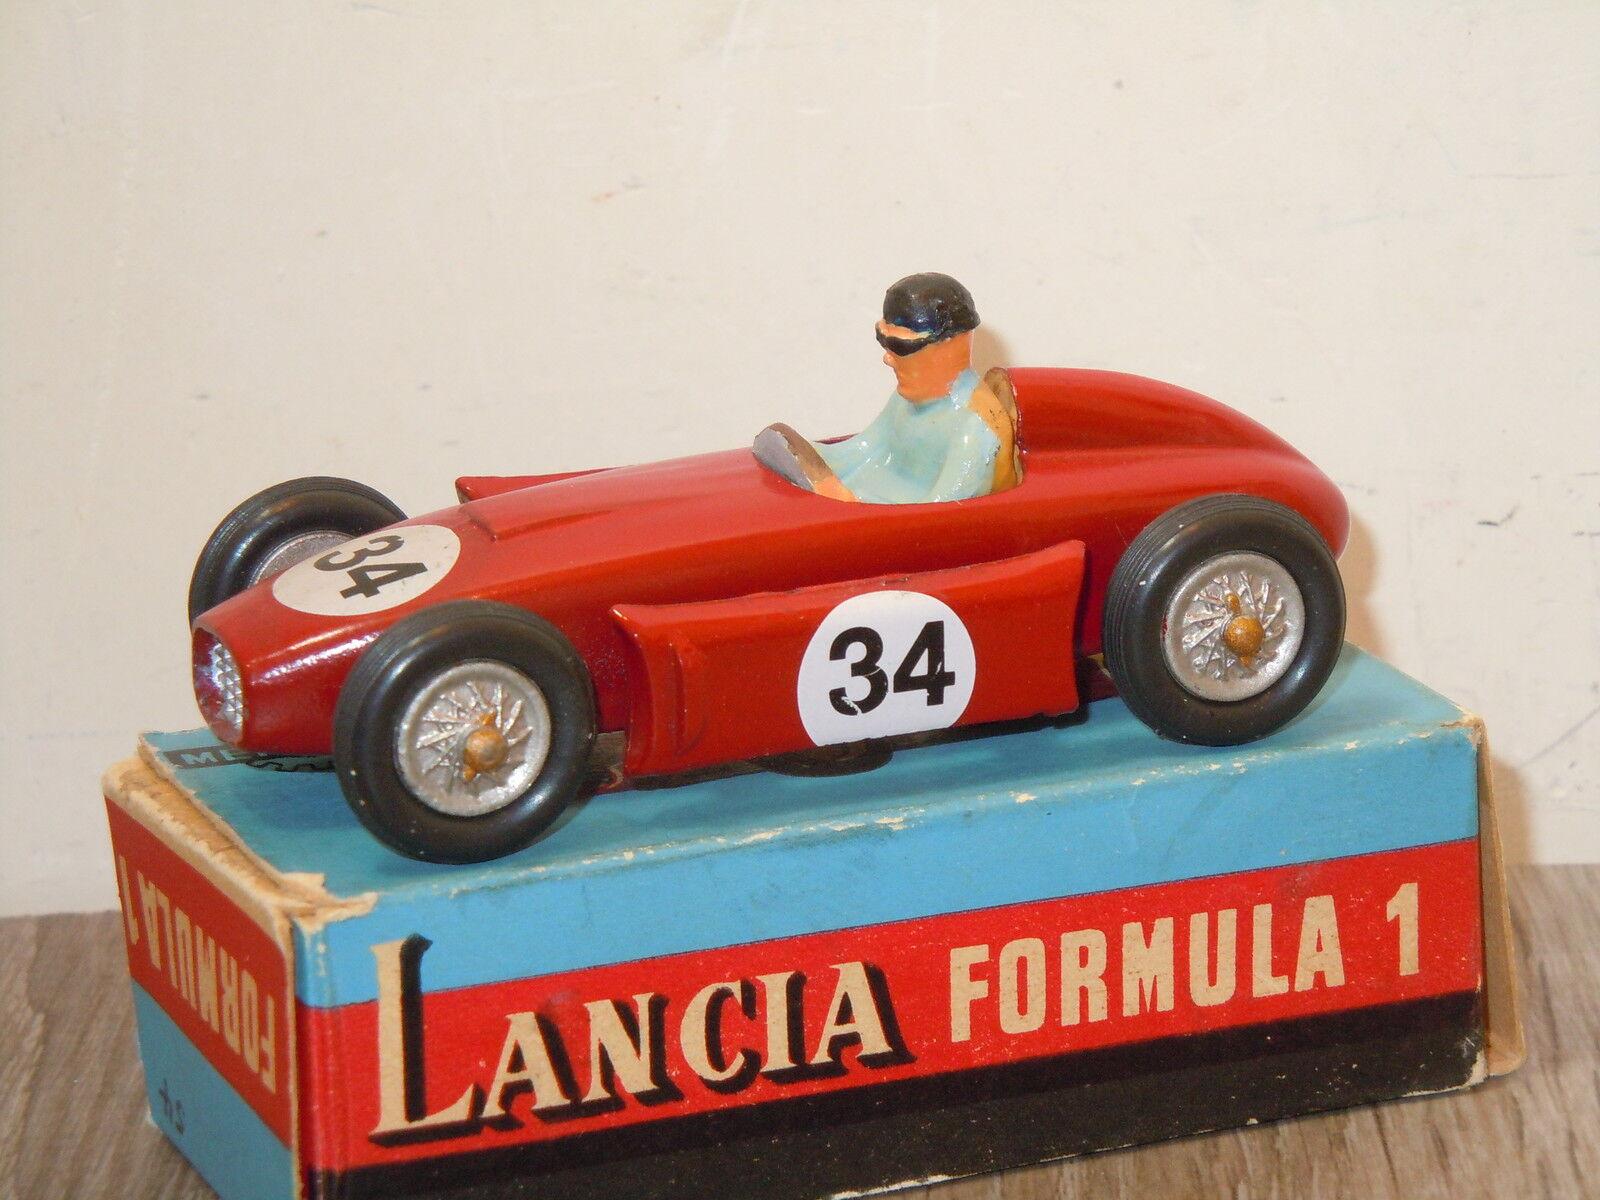 Lancia D.50 Formula 1 van Mercury 54 Italy in Box *18569